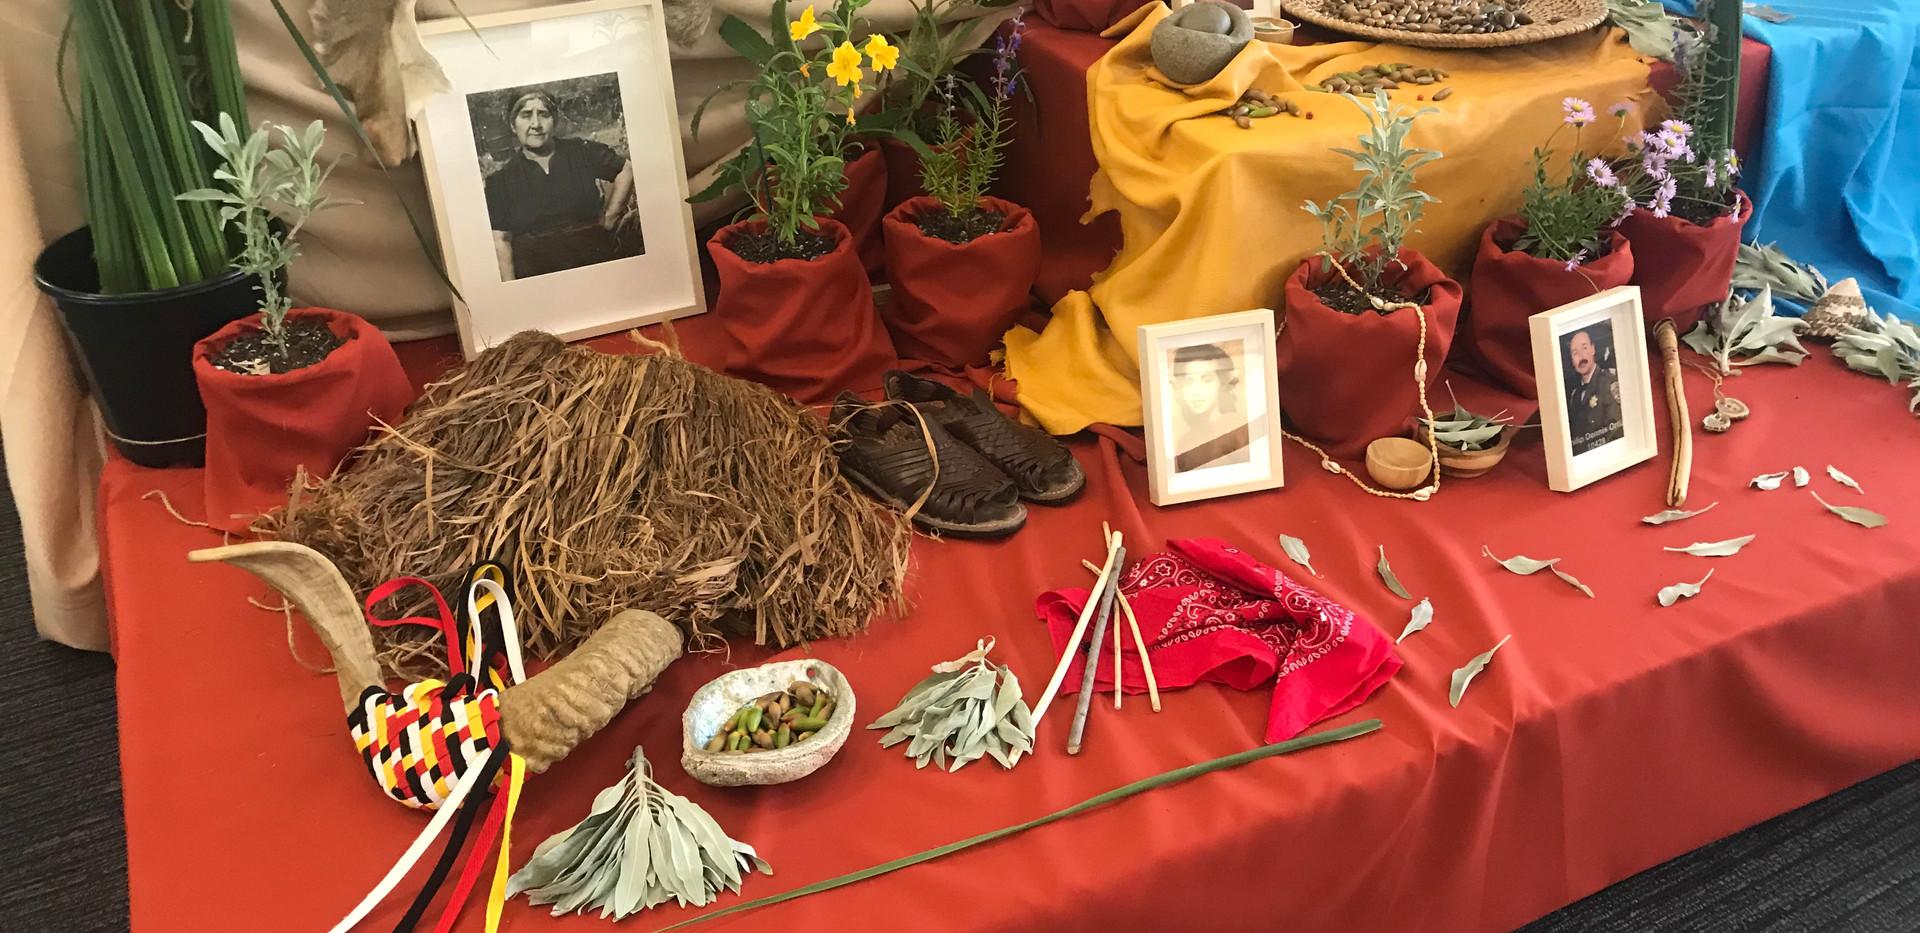 Yaanga Vive! Altar with California native plants